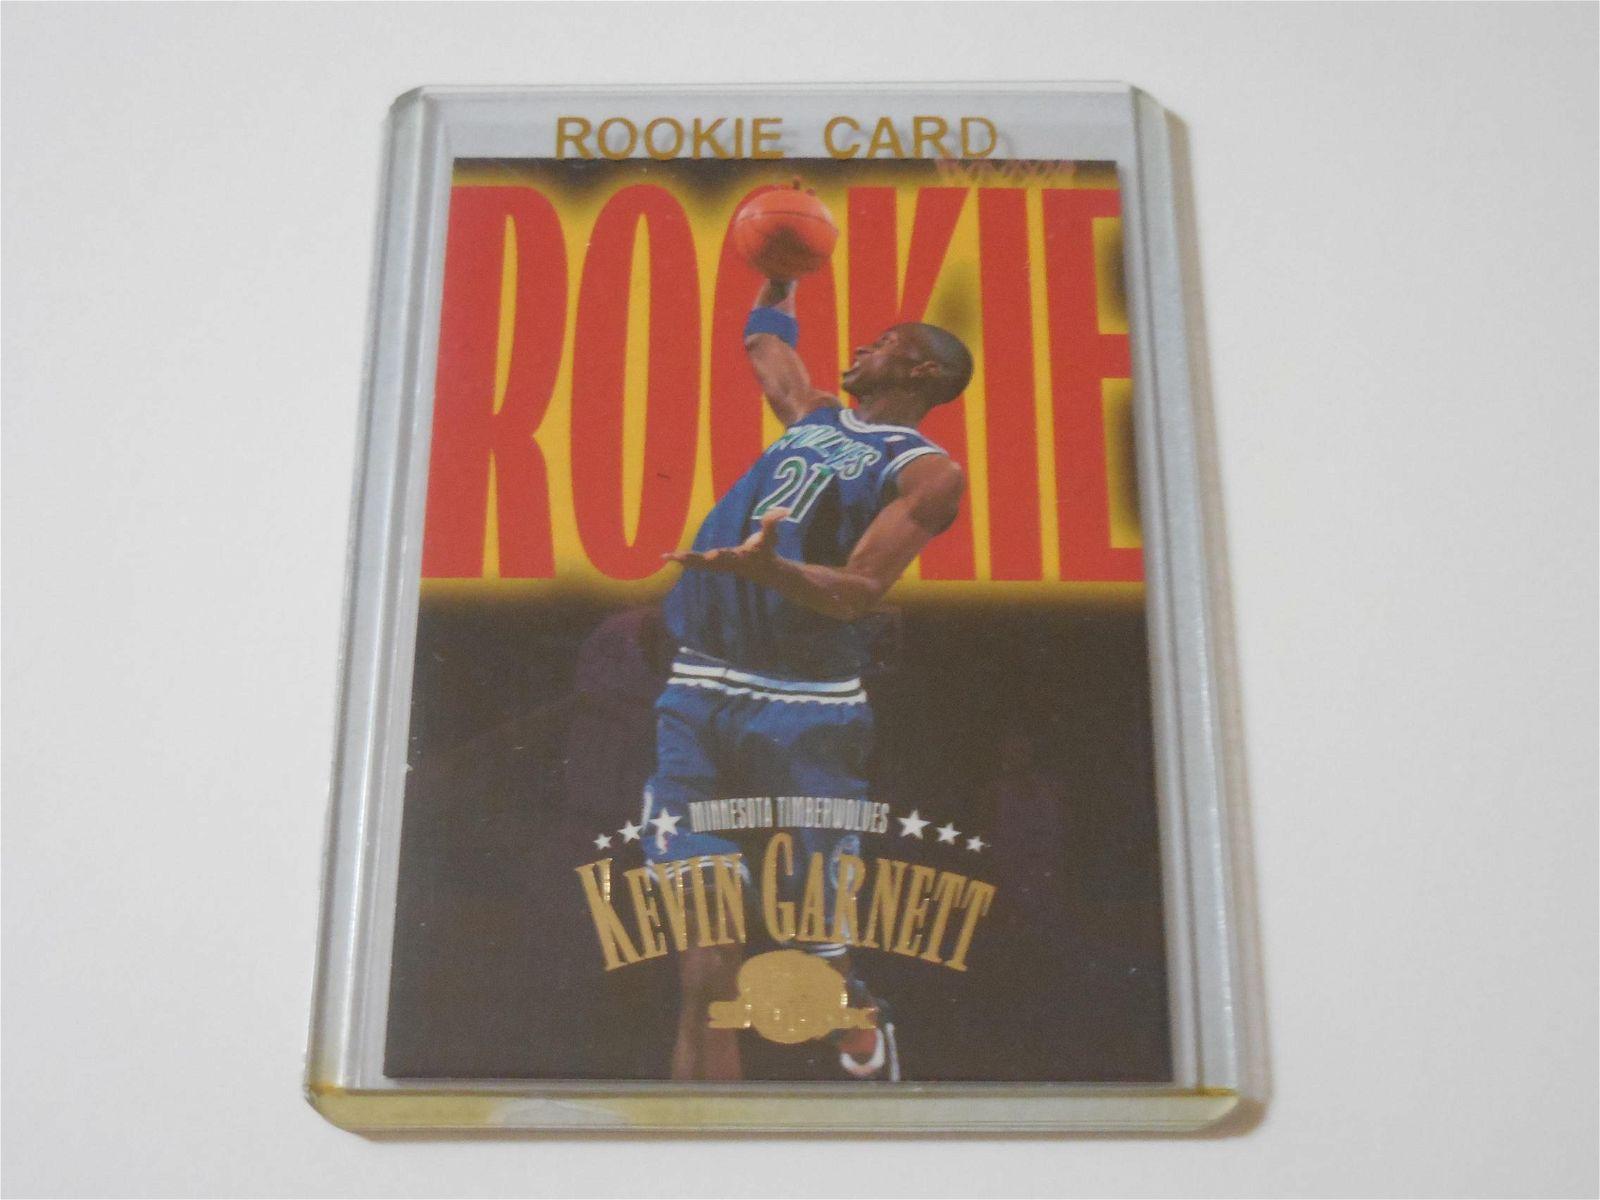 1995-96 SKYBOX PREMIUM KEVIN GARNETT ROOKIE CARD